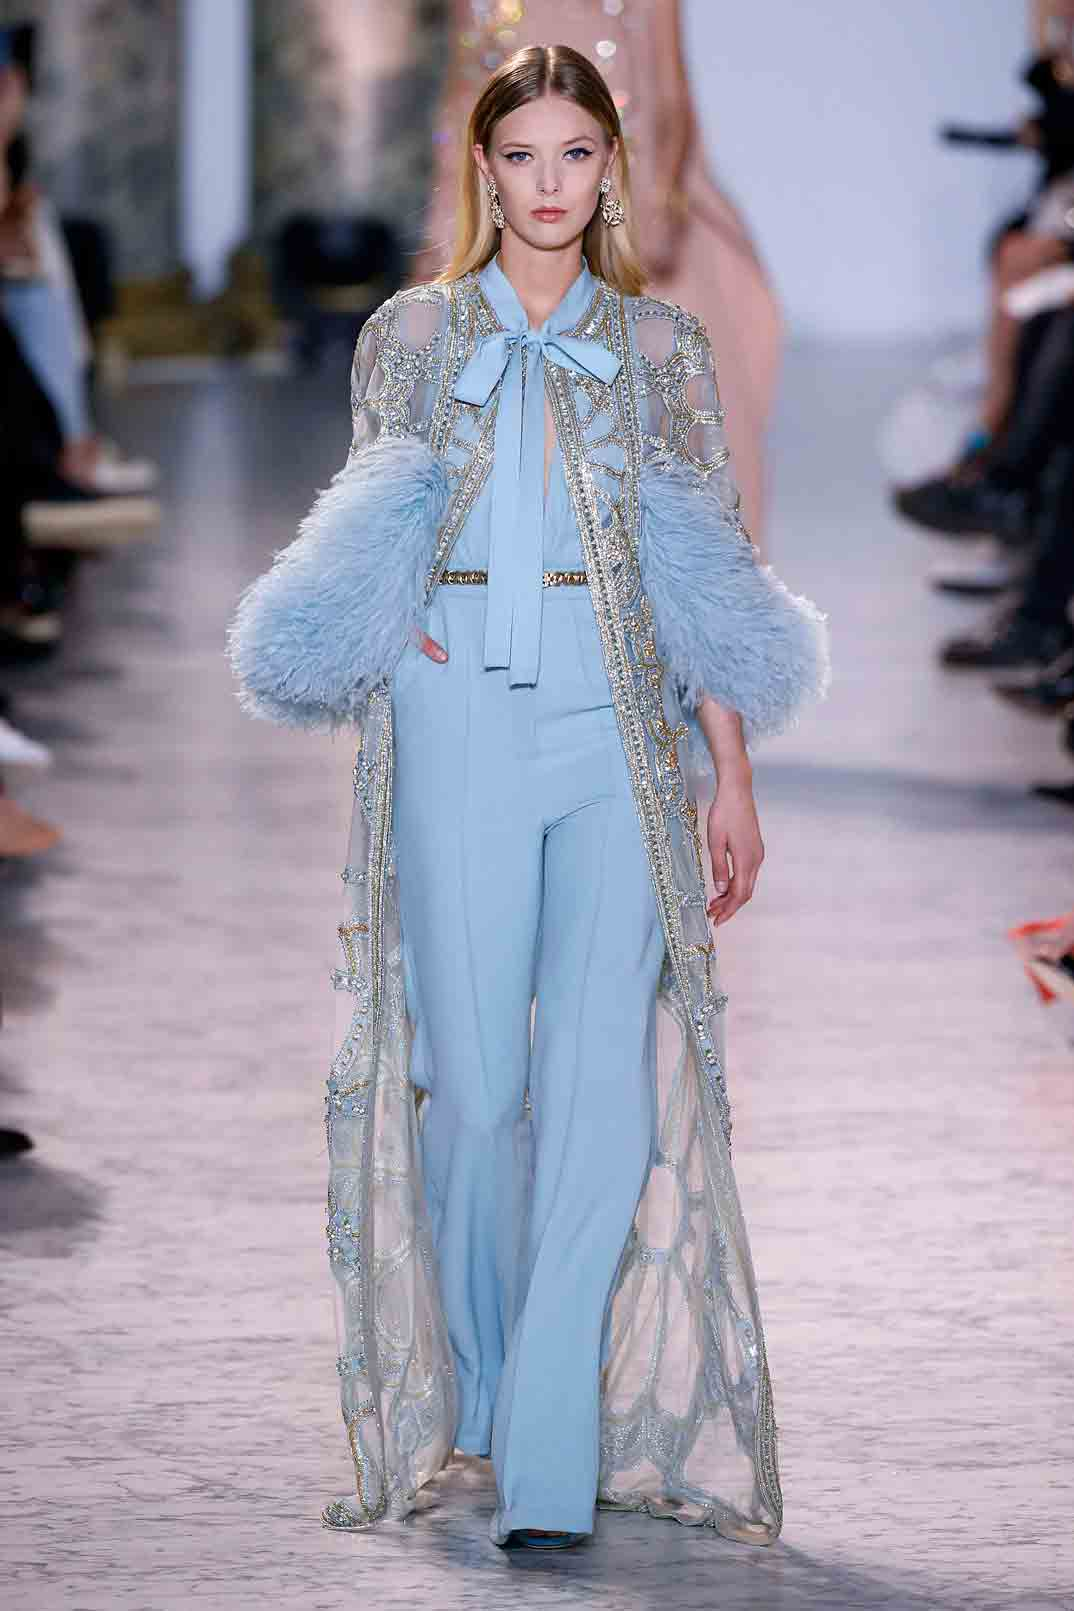 París Fashion Week 2017: Elie Saab-Alta Costura